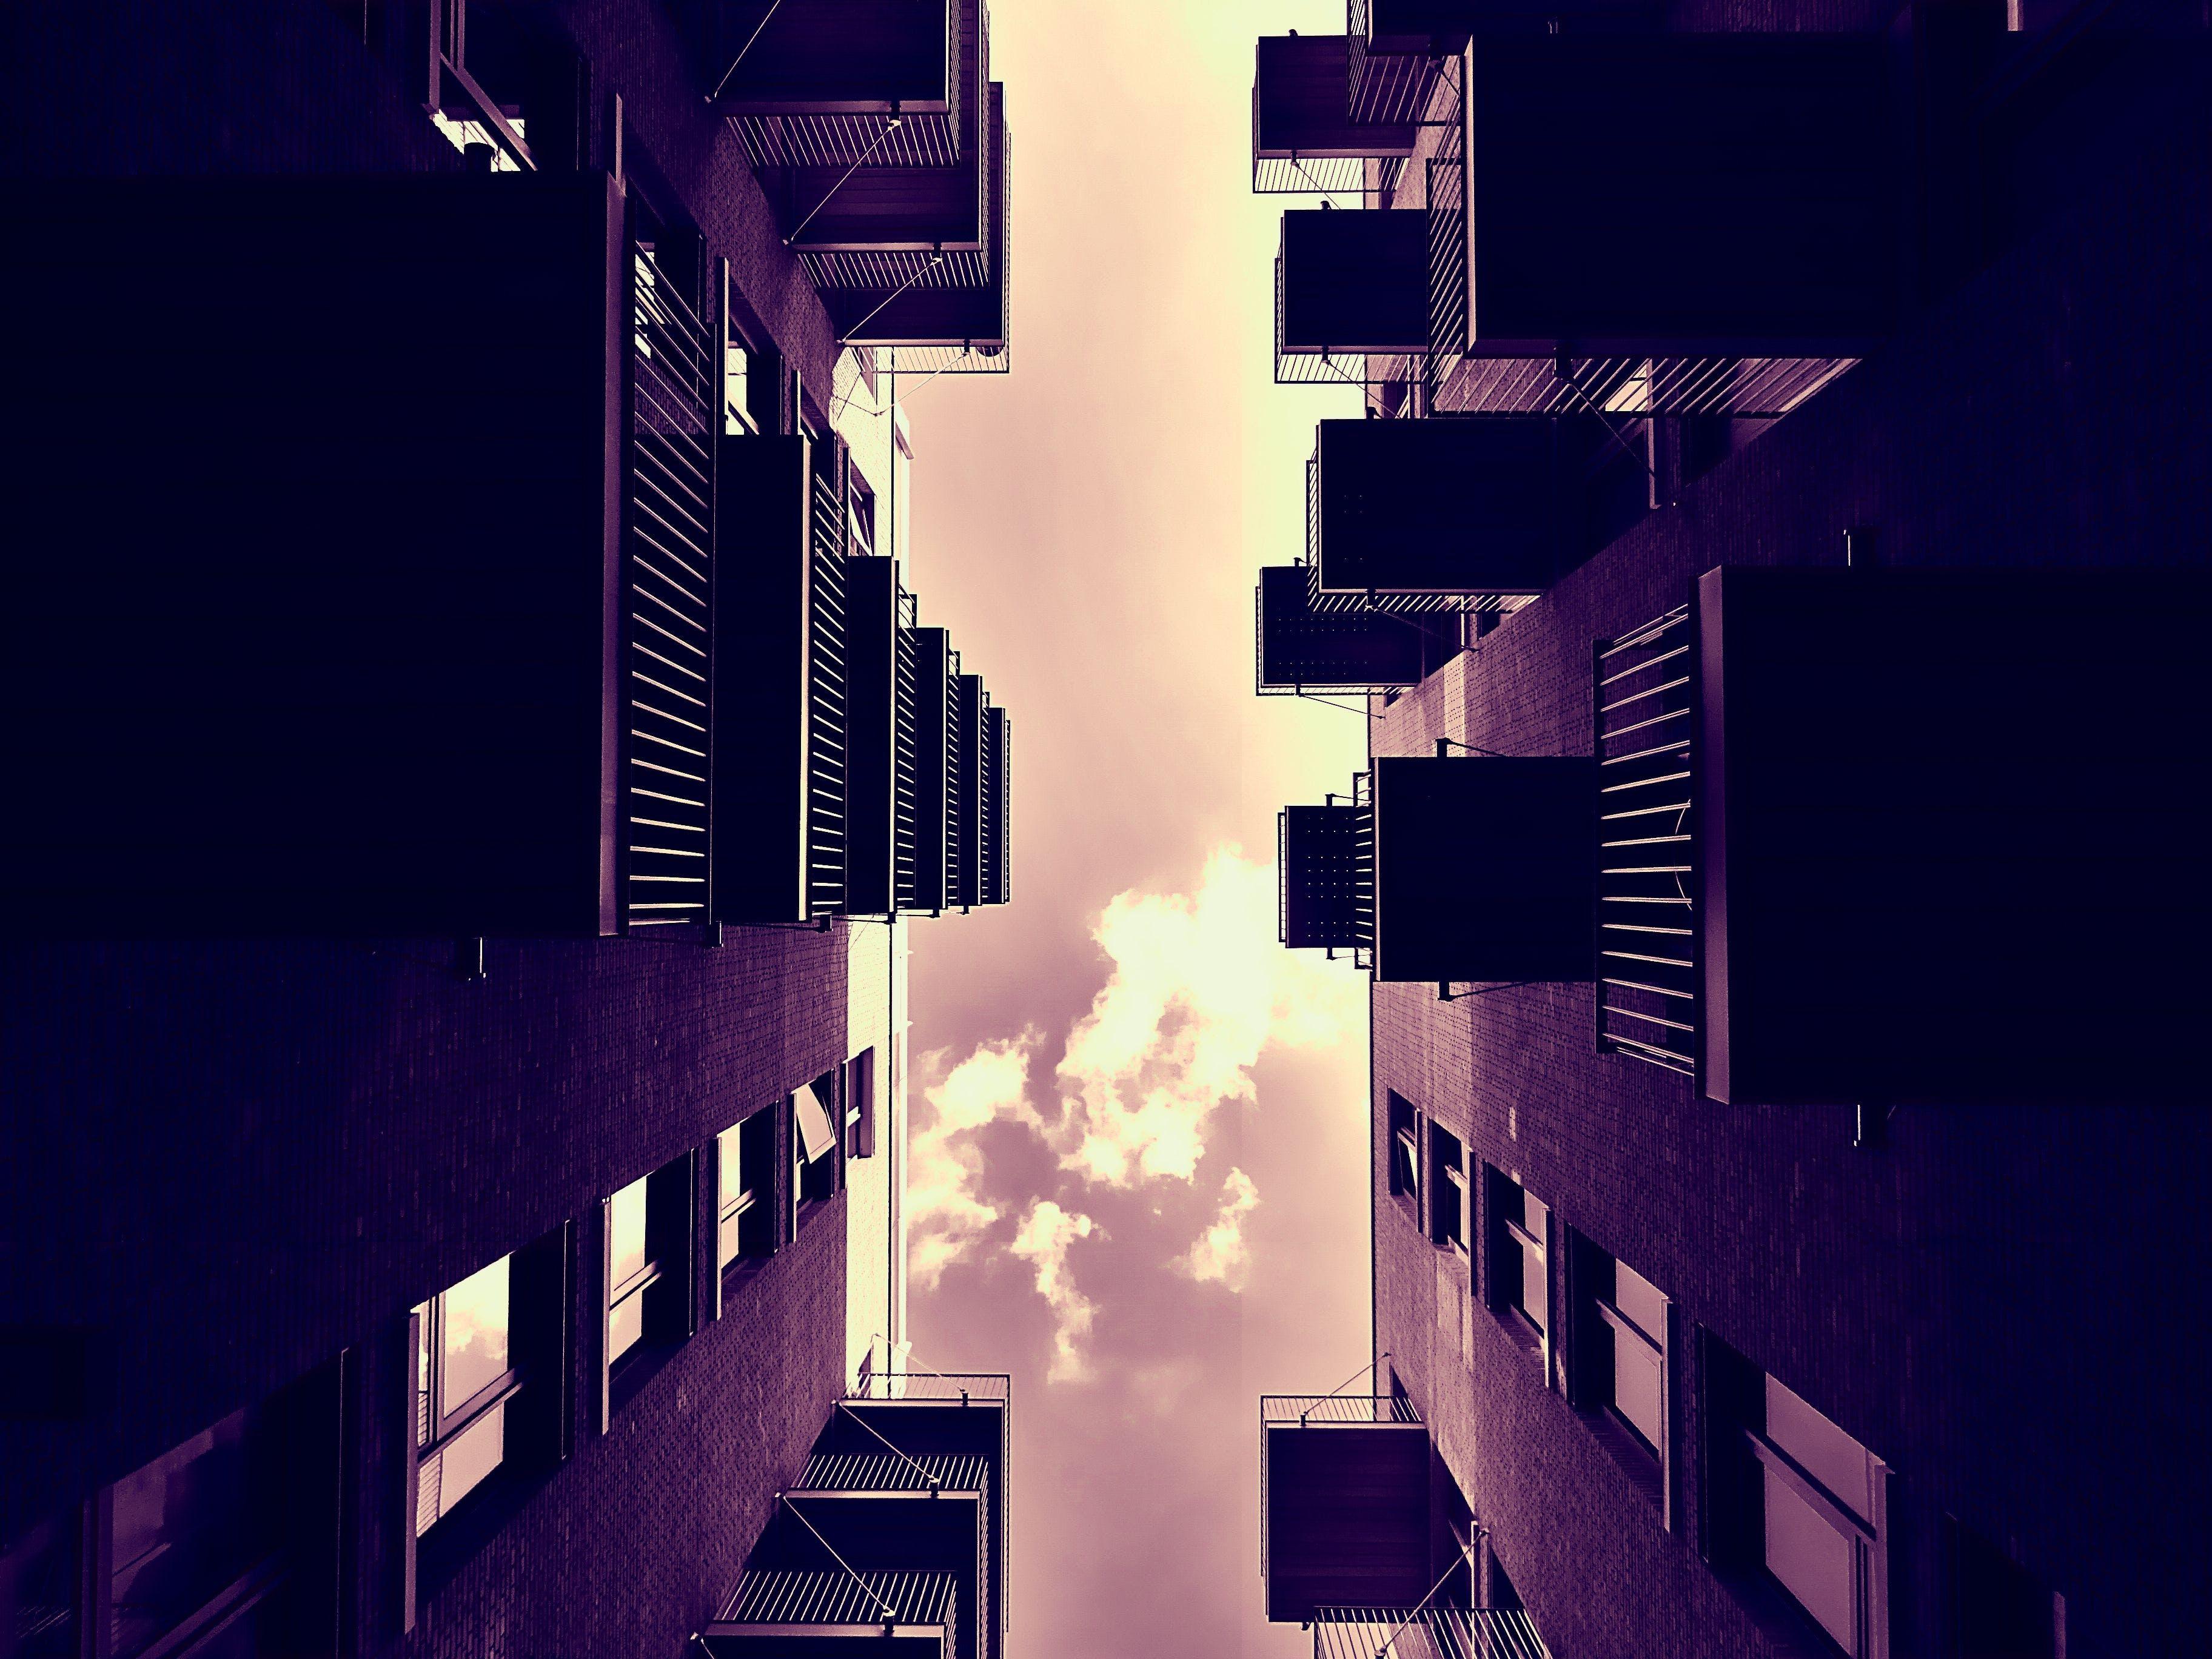 architecture, balconies, building